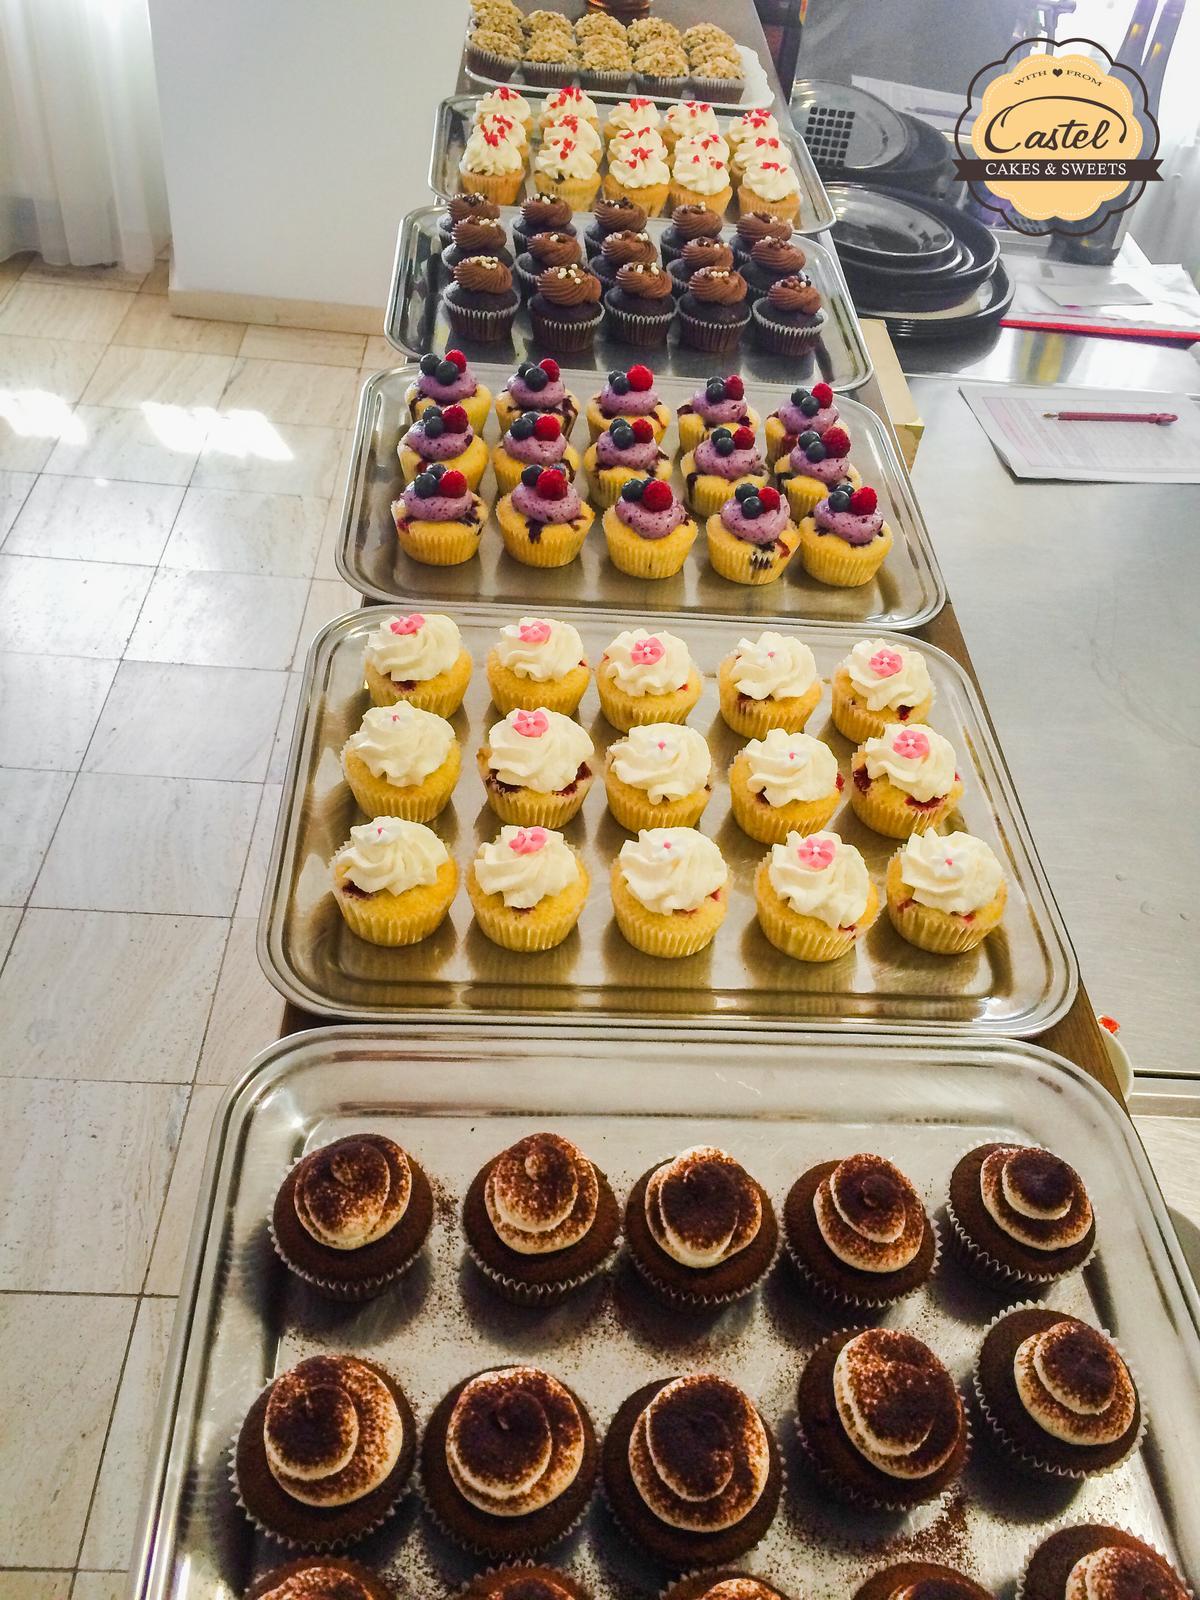 Candy Bar a sladké dobroty od Castel Cakes & Sweets - Http://castel.sk/cakes-sweets/